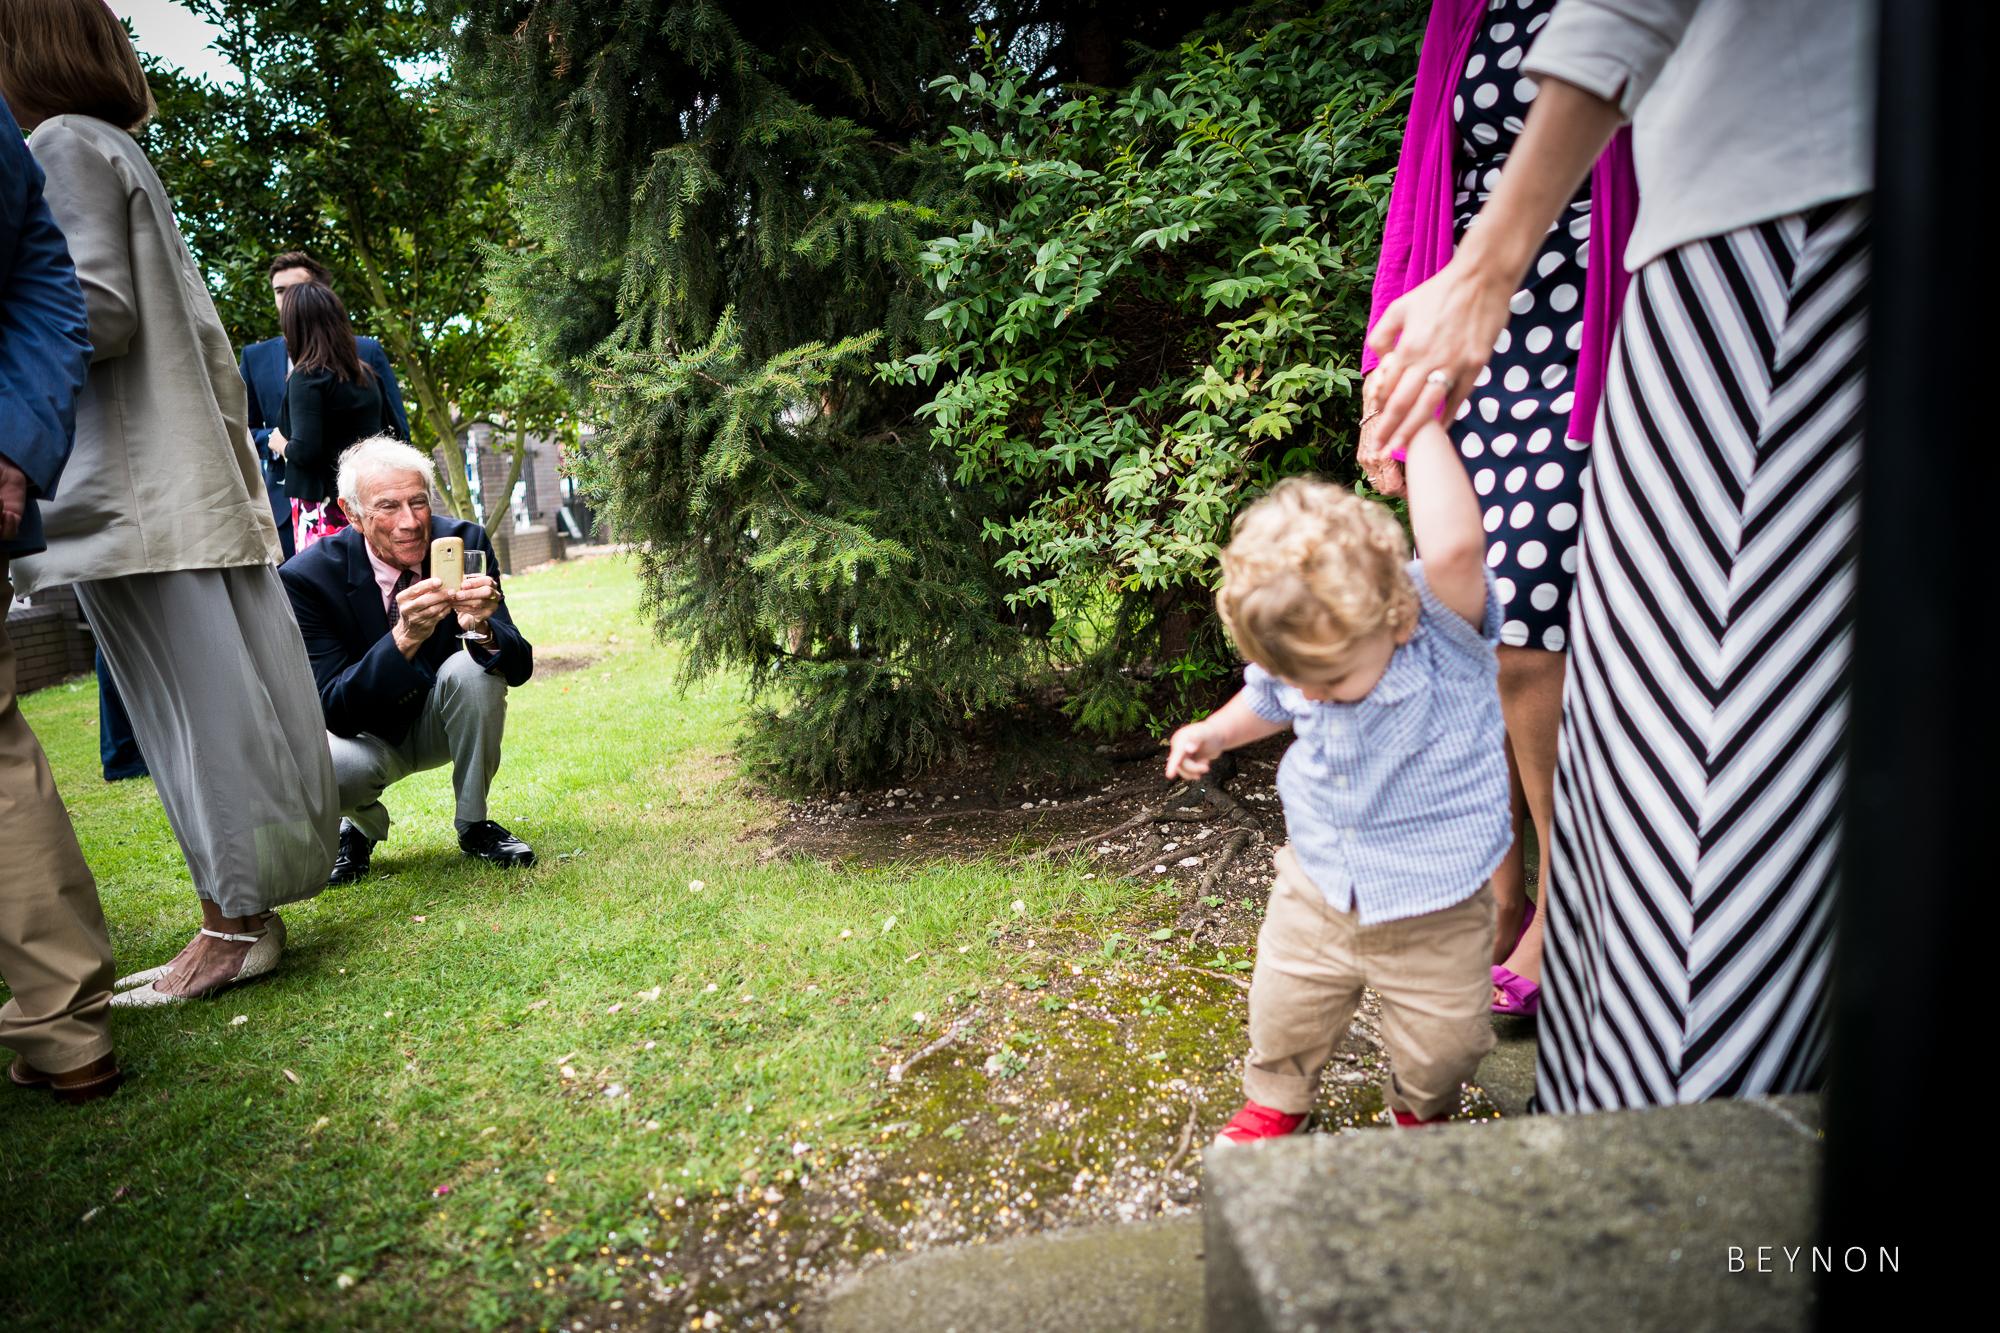 Guests take photographs